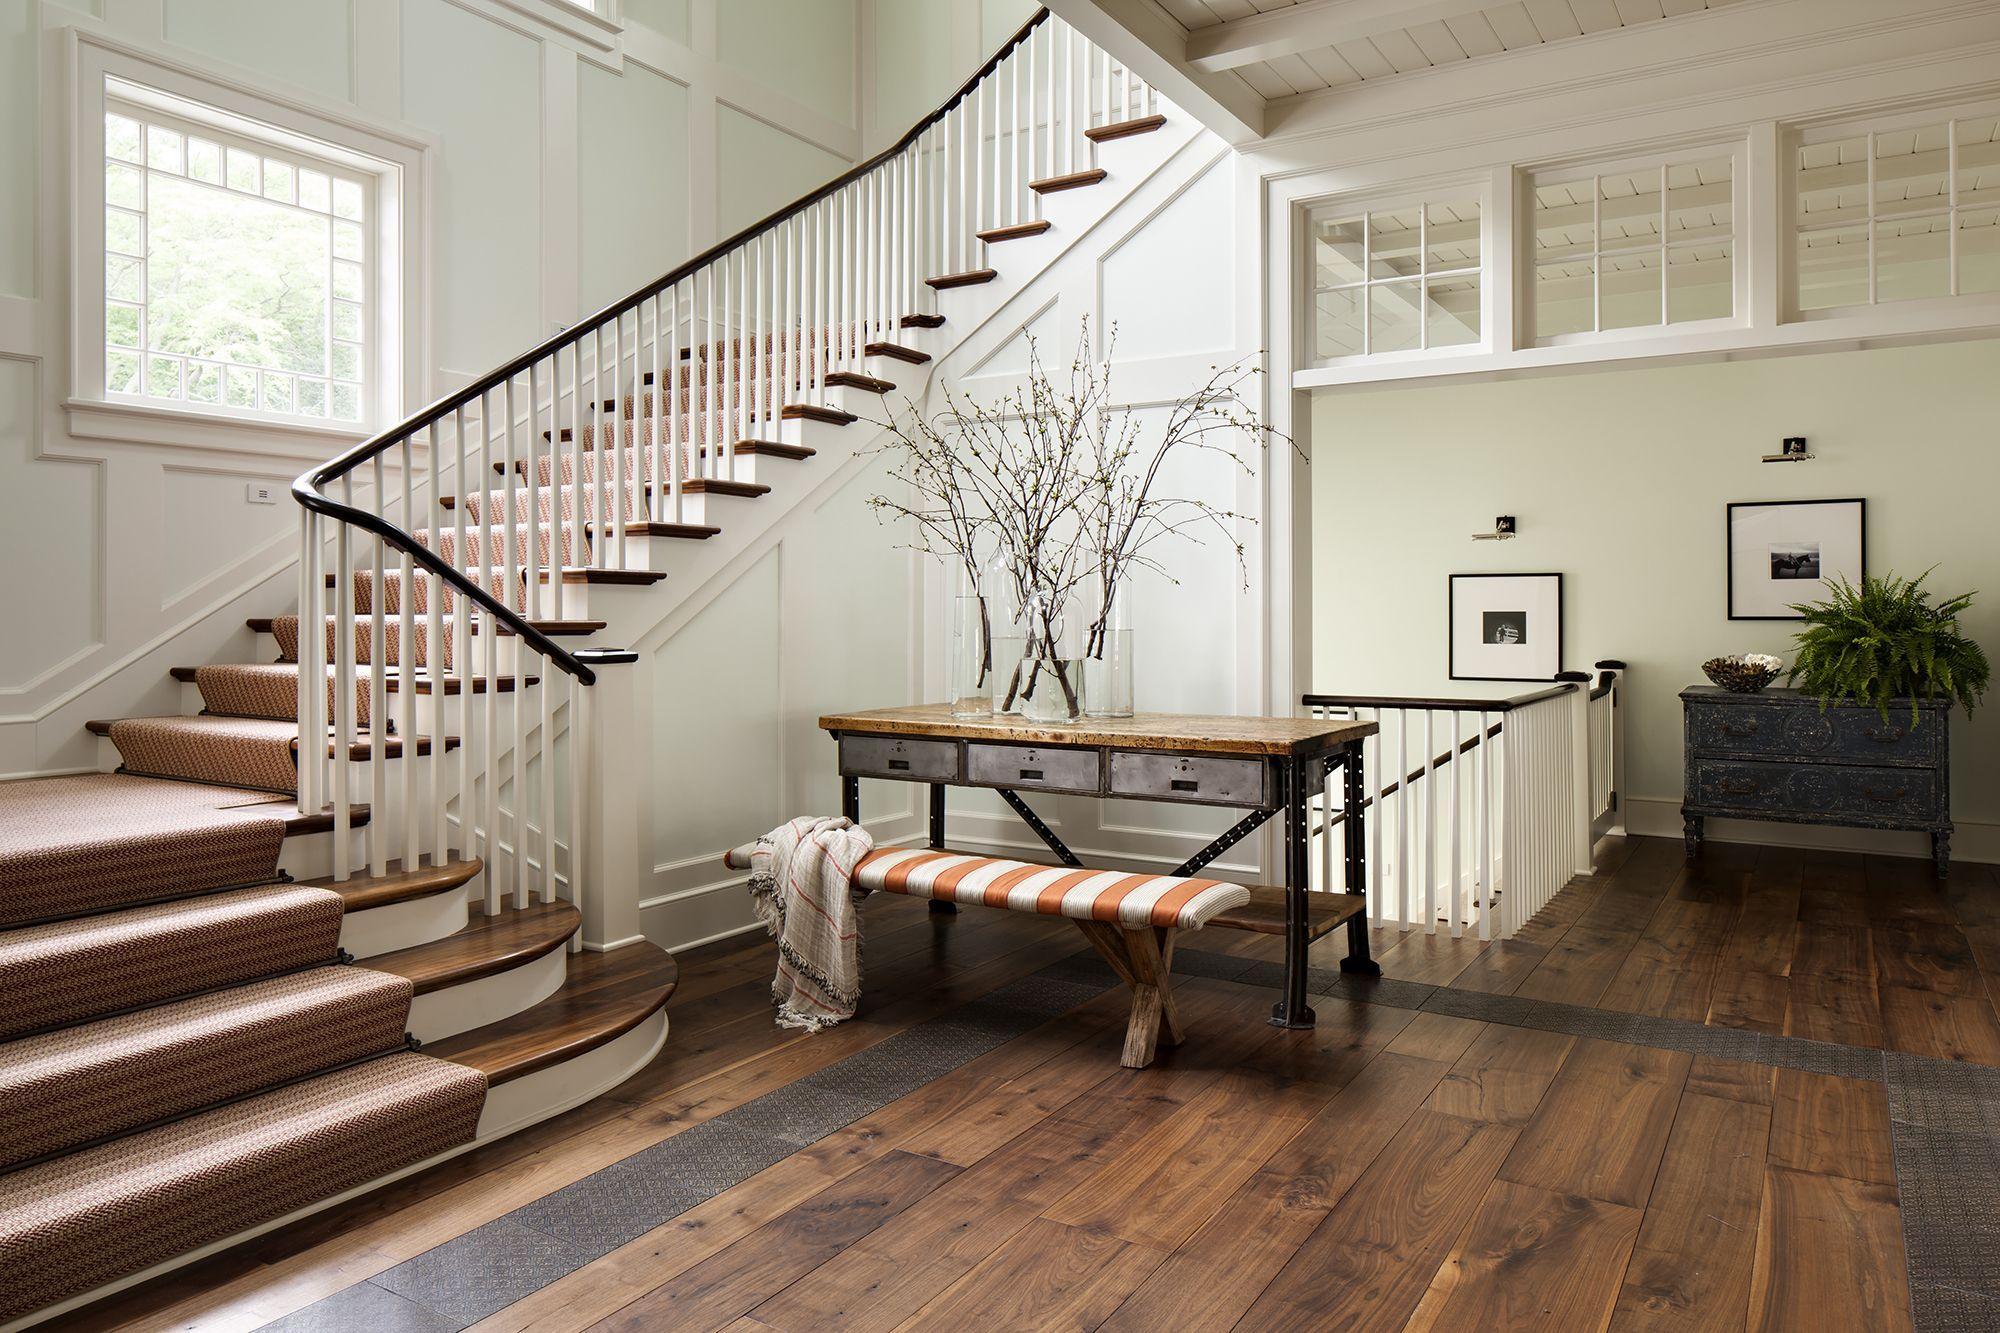 27 stylish staircase decorating ideas how to decorate stairways rh elledecor com